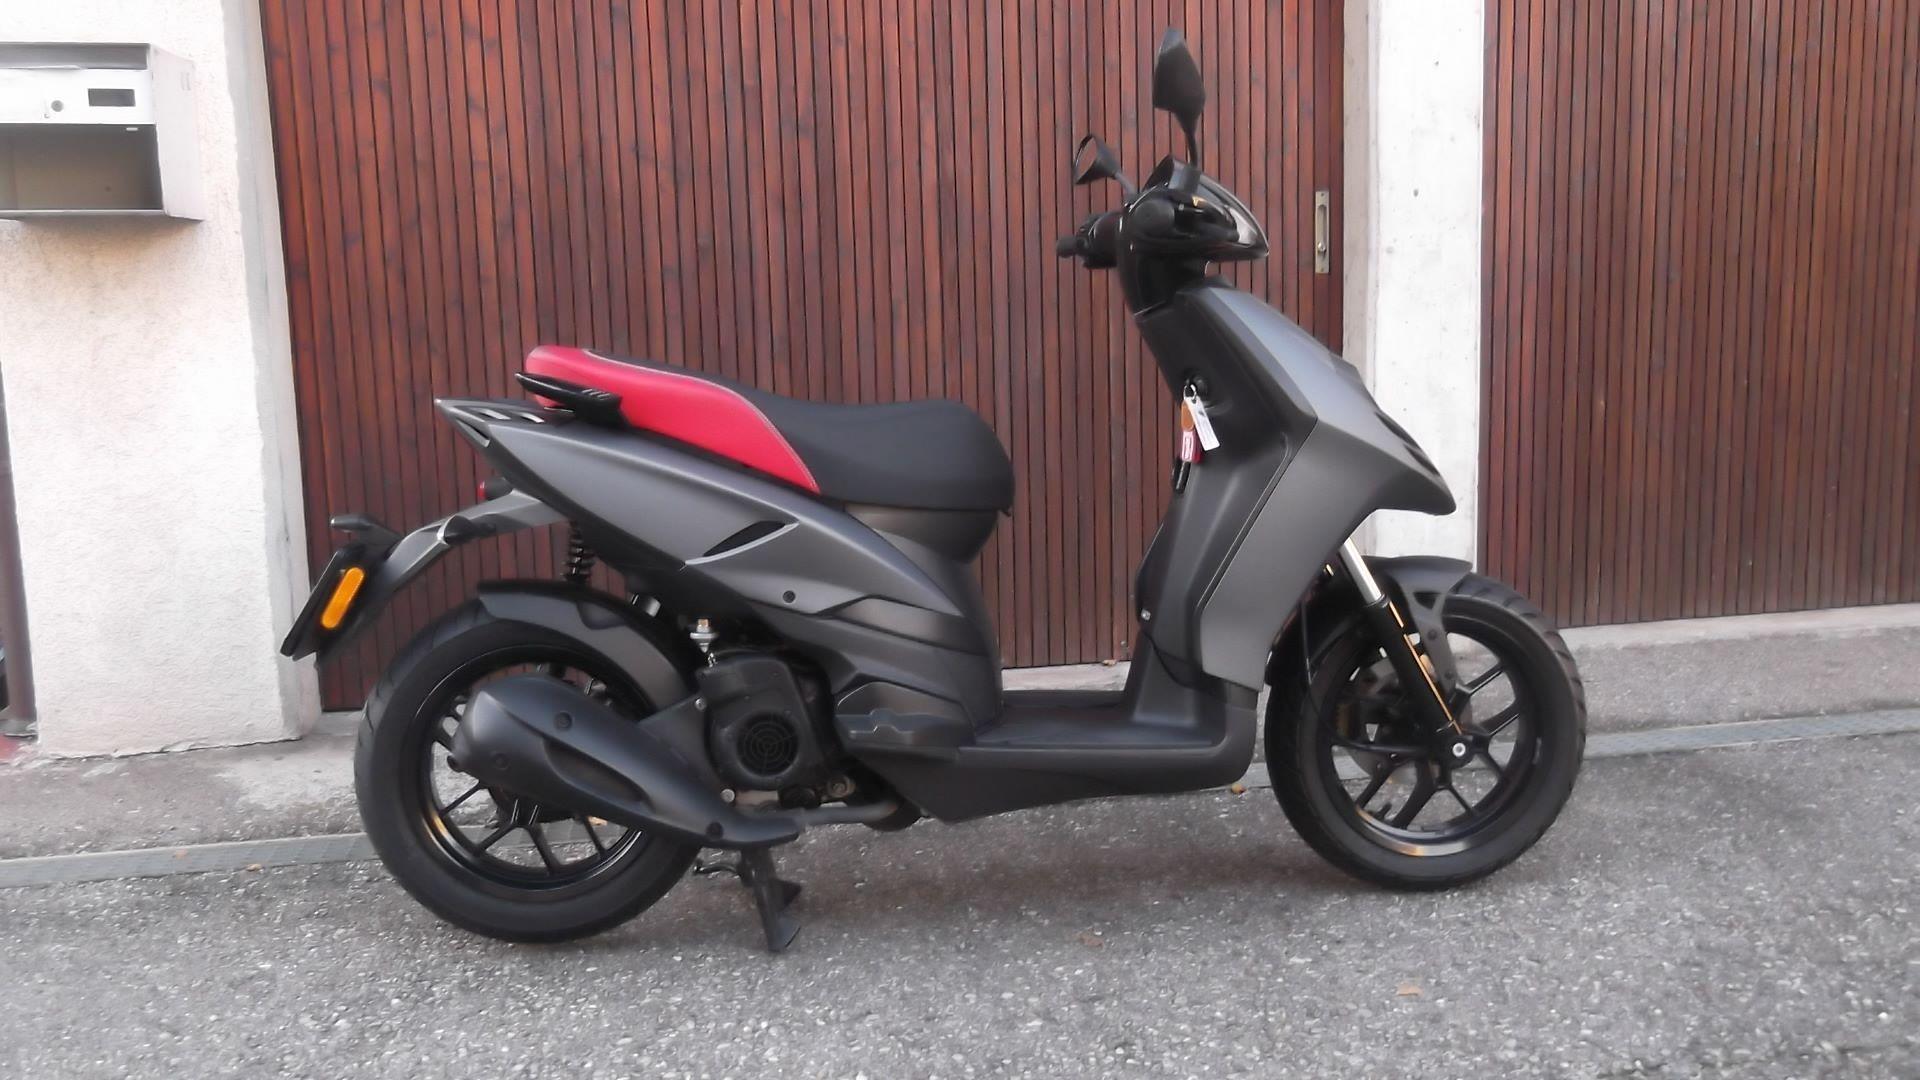 motorrad occasion kaufen aprilia sr 125 motard delta motos. Black Bedroom Furniture Sets. Home Design Ideas